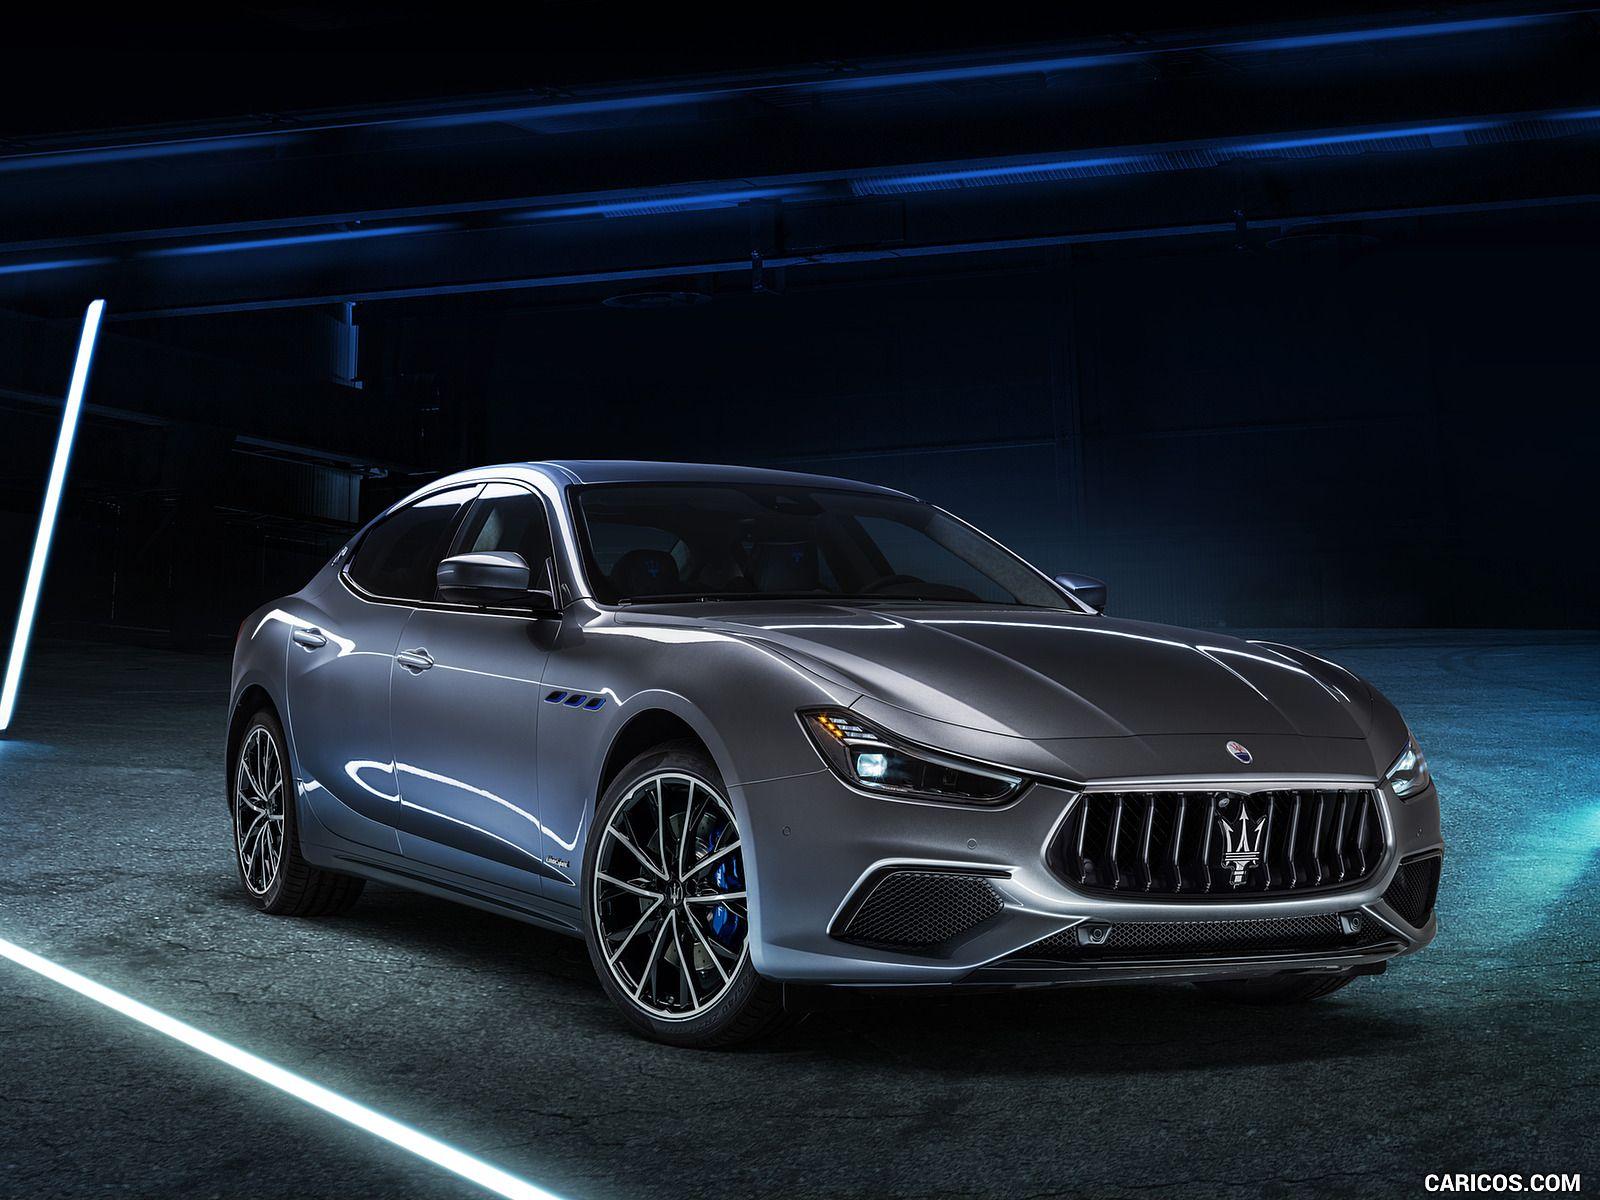 2021 Maserati Ghibli Hybrid in 2020 Maserati ghibli